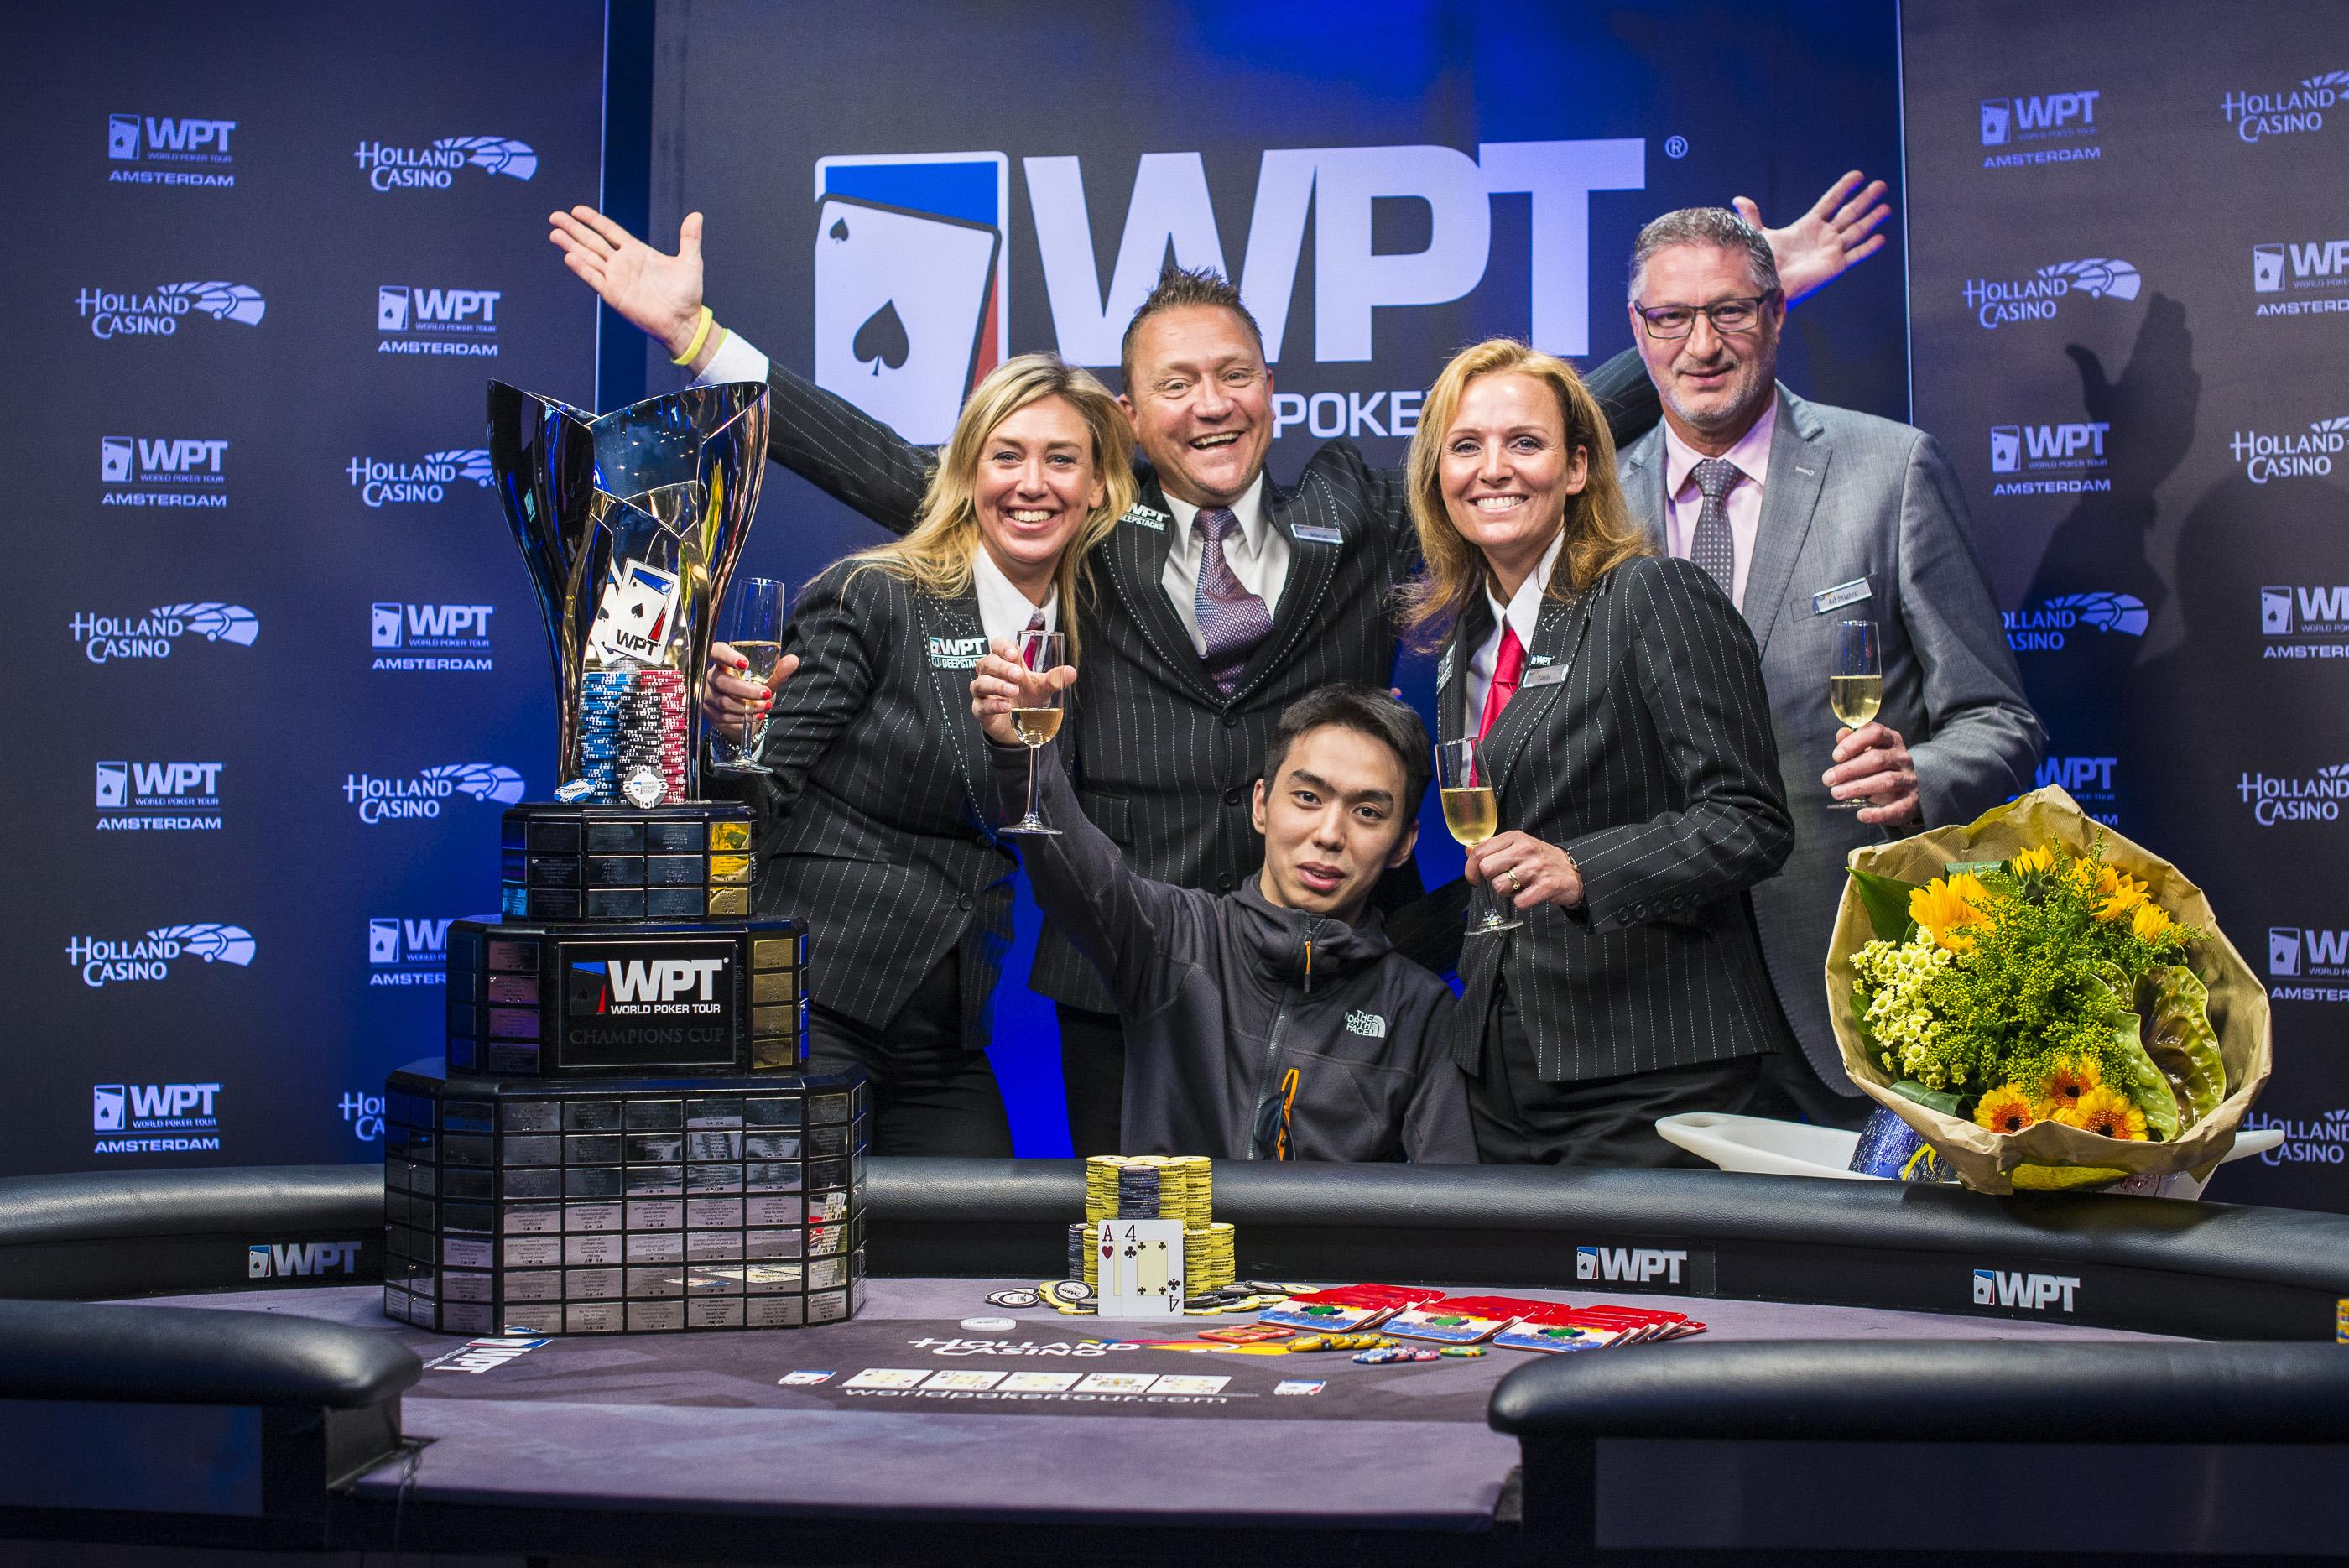 WPT Amsterdam - Daniel Daniyar wint Main Event voor €152.600, Wetemans wint €1k Hyper 103